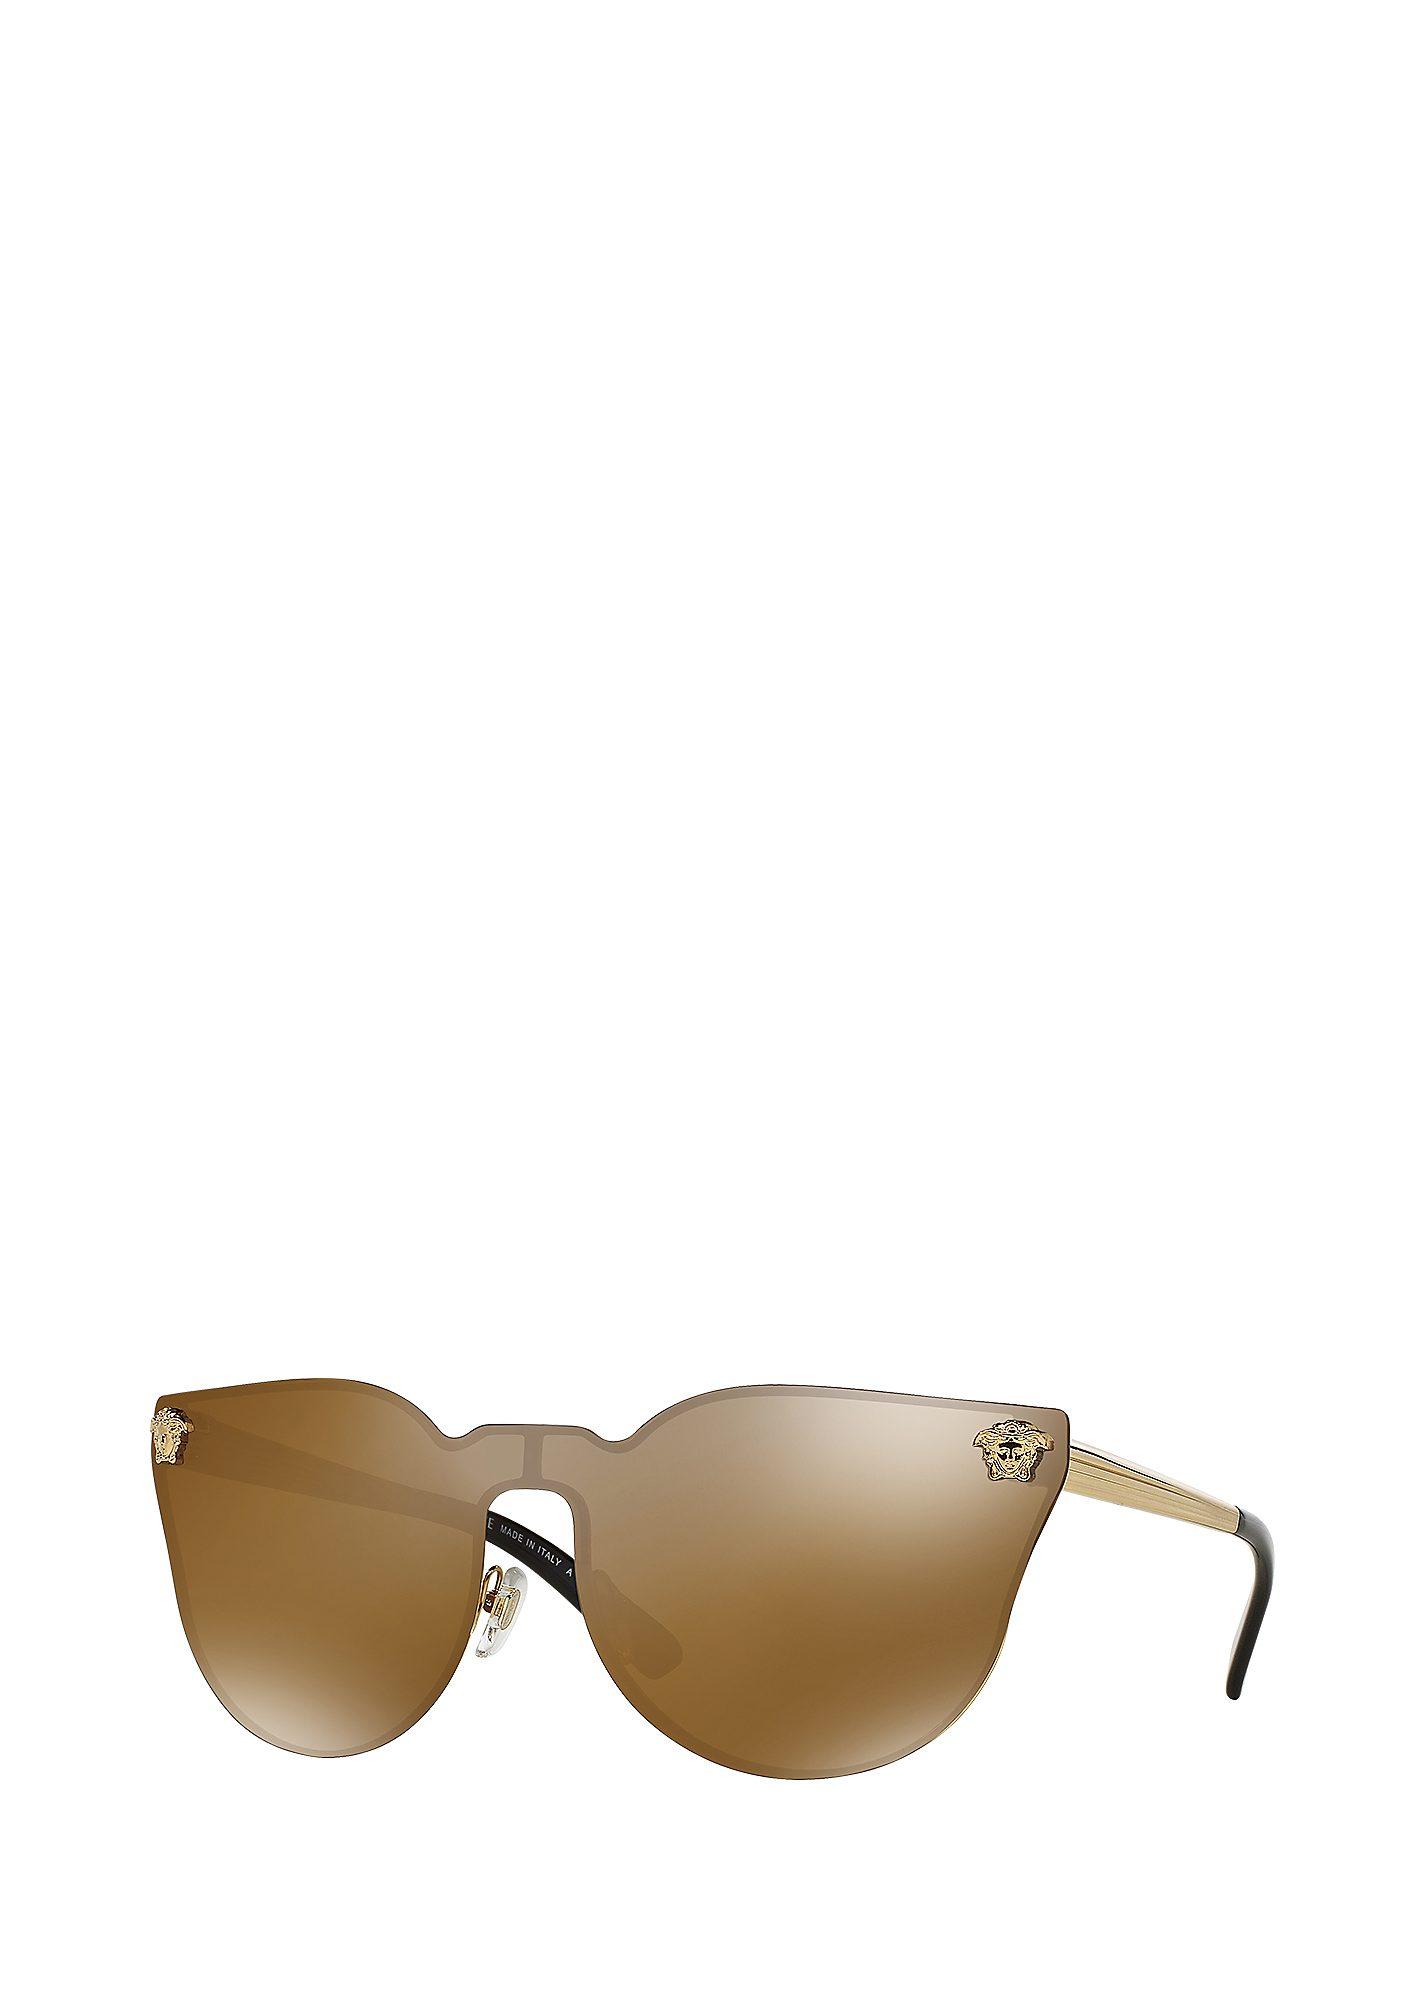 Versace Metal Cat-eye Sunglasses jj Cat-eye Bronze Sunglasses